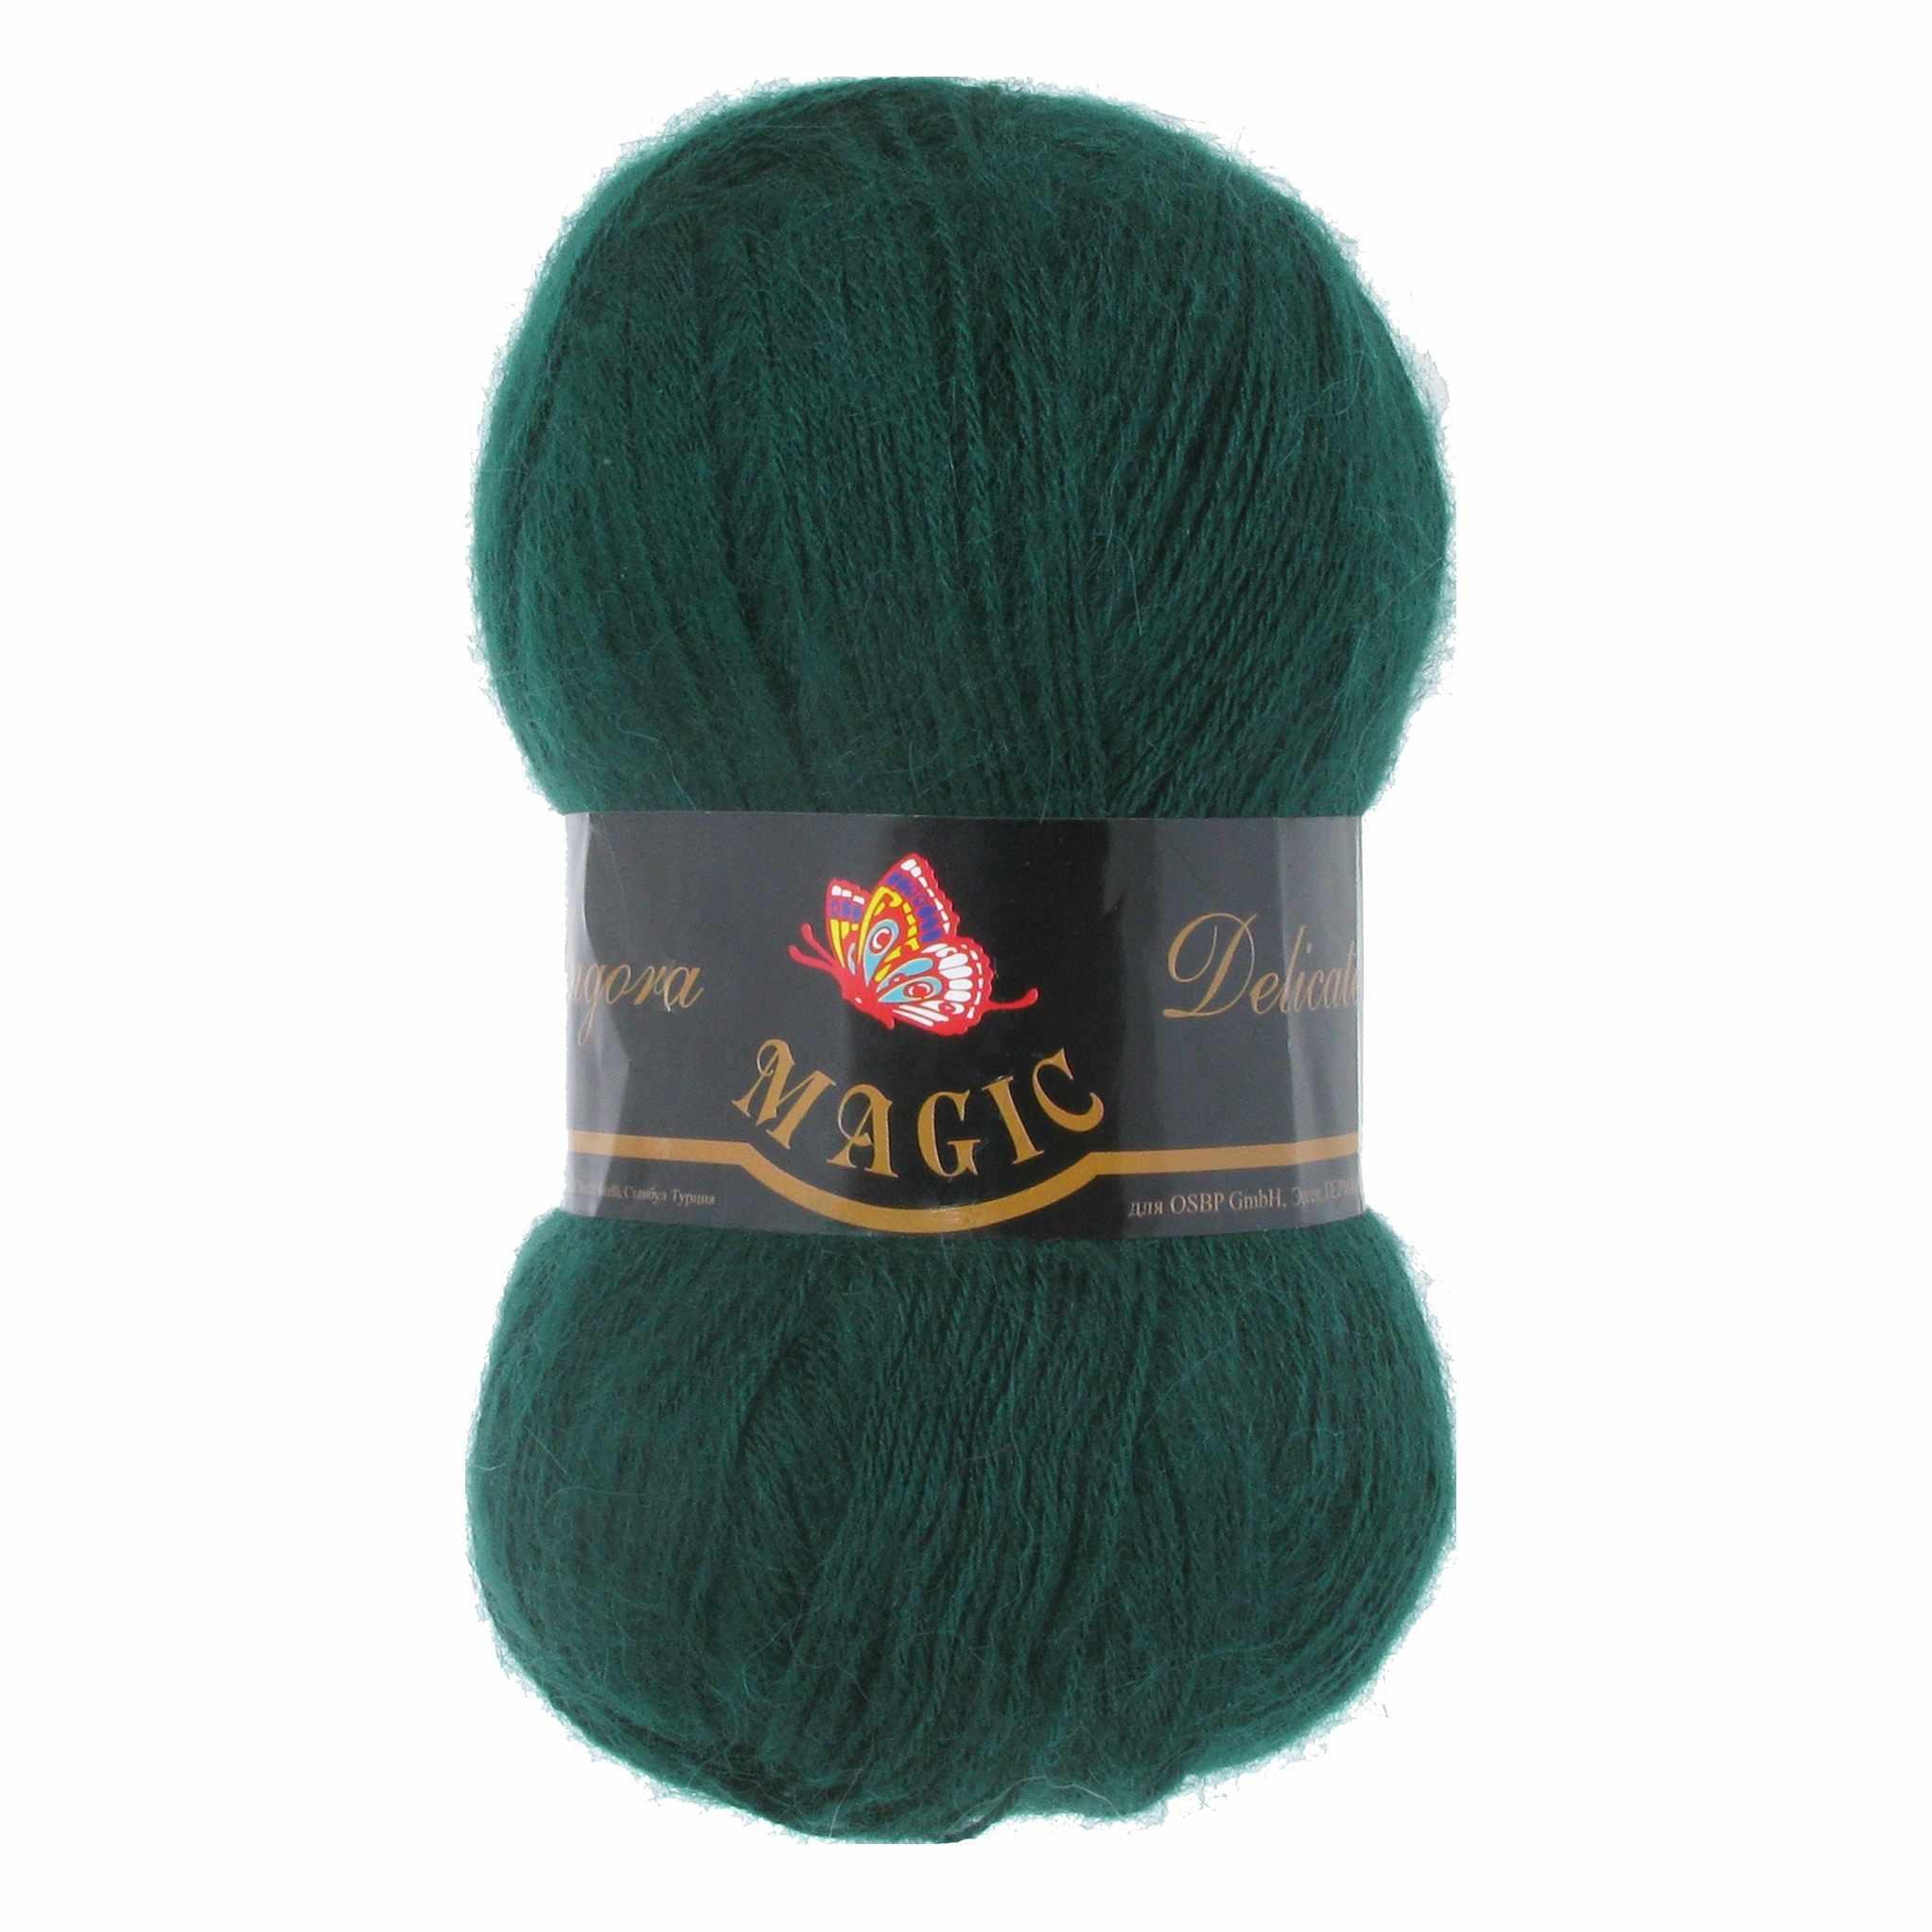 Пряжа Magic Angora Delicate Цвет.1109 Темно-зеленый